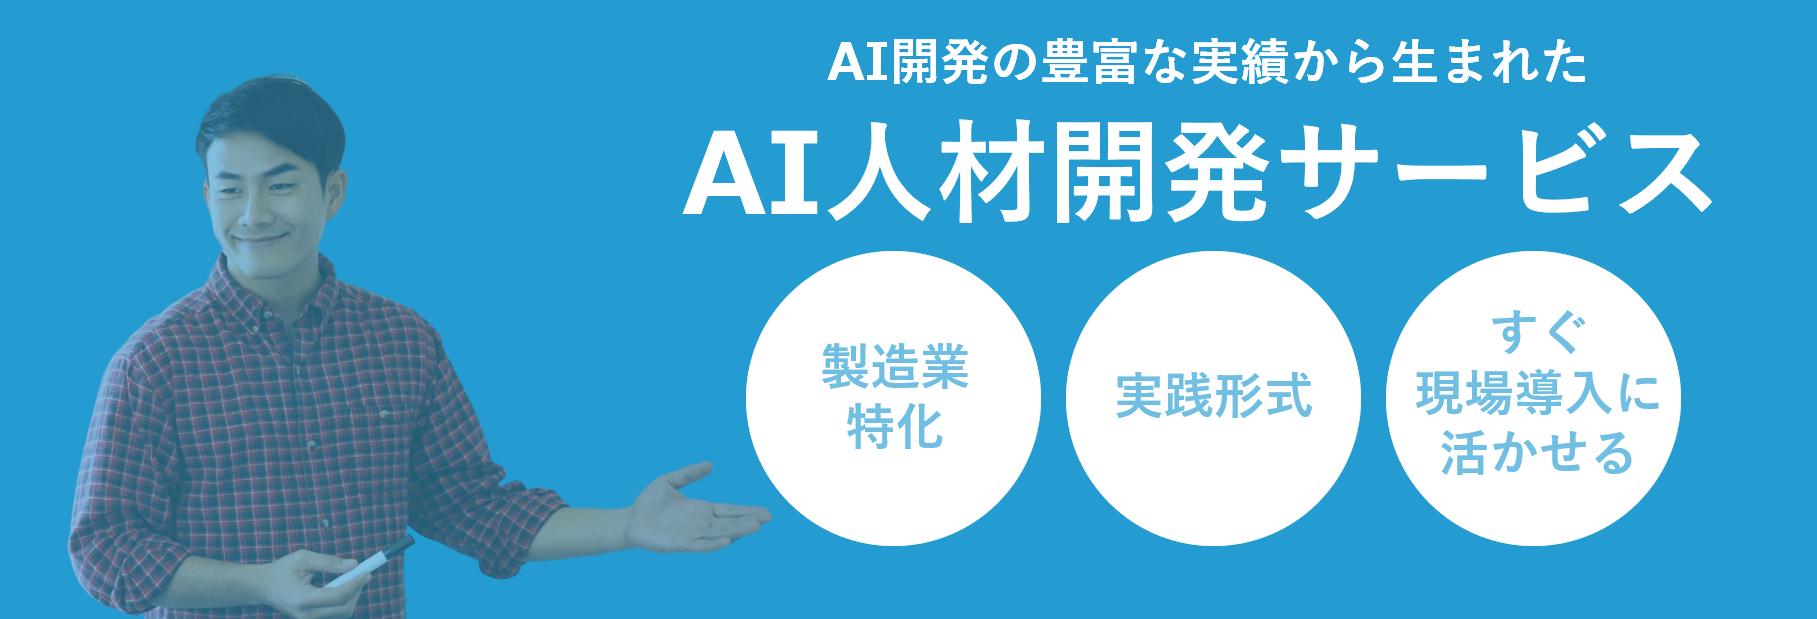 AI人材開発サービス 製造業特化 実践形式 すぐ現場導入に活かせる